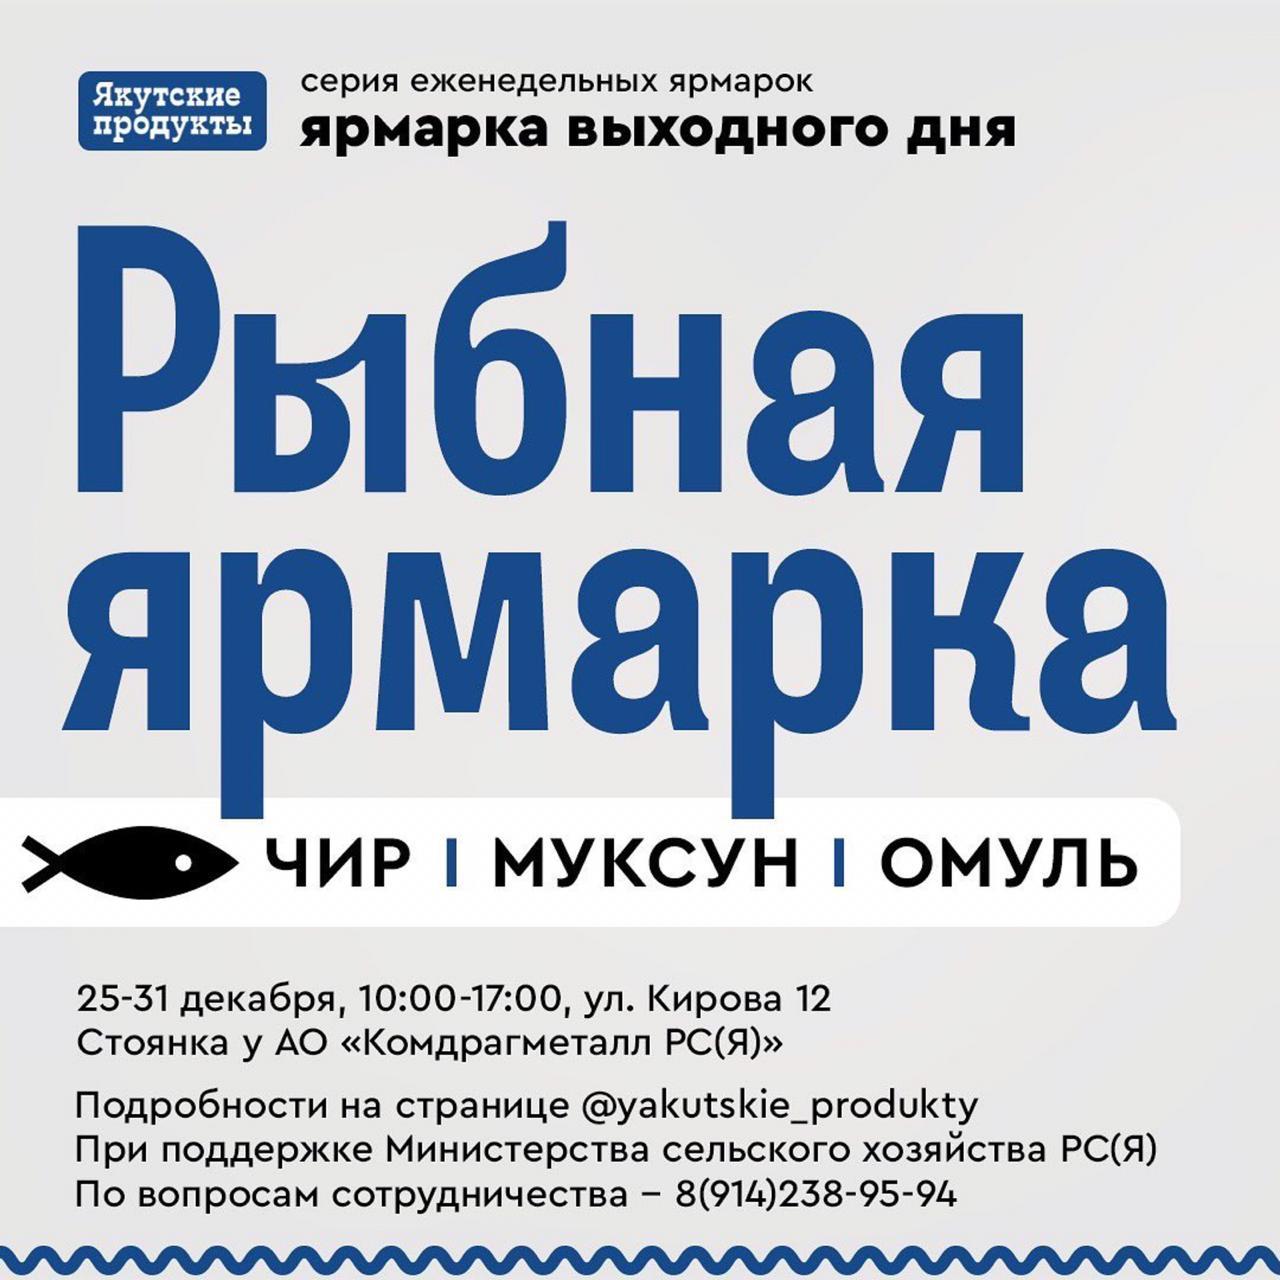 Завтра стартует Рыбная ярмарка в старом городе!